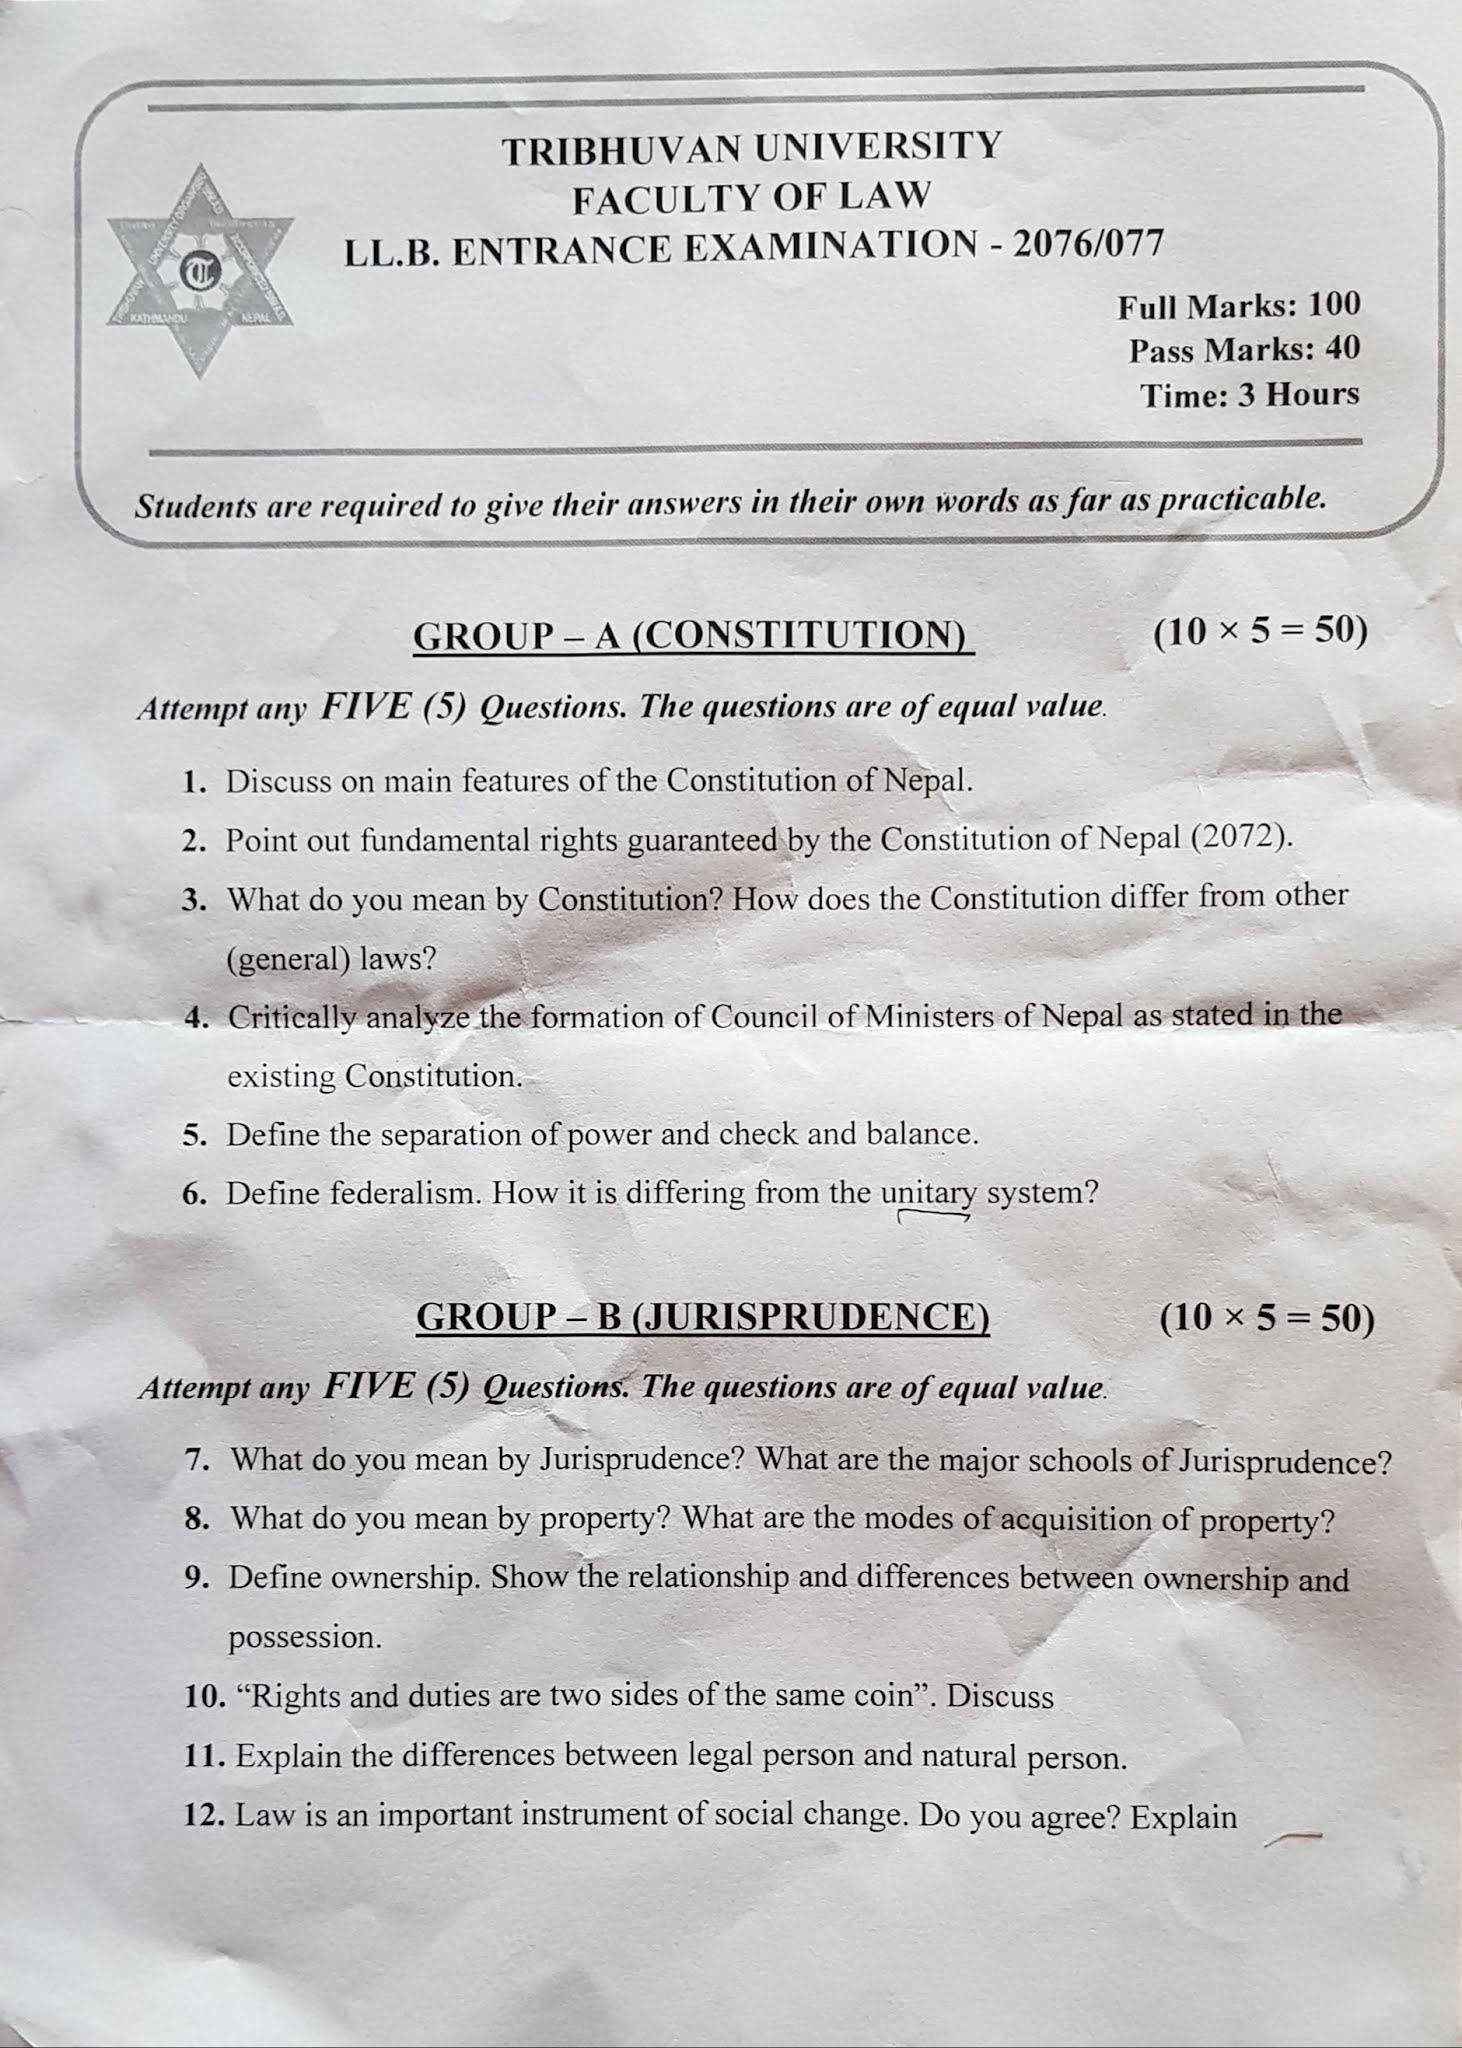 LLB Entrance Exam TU Question Paper